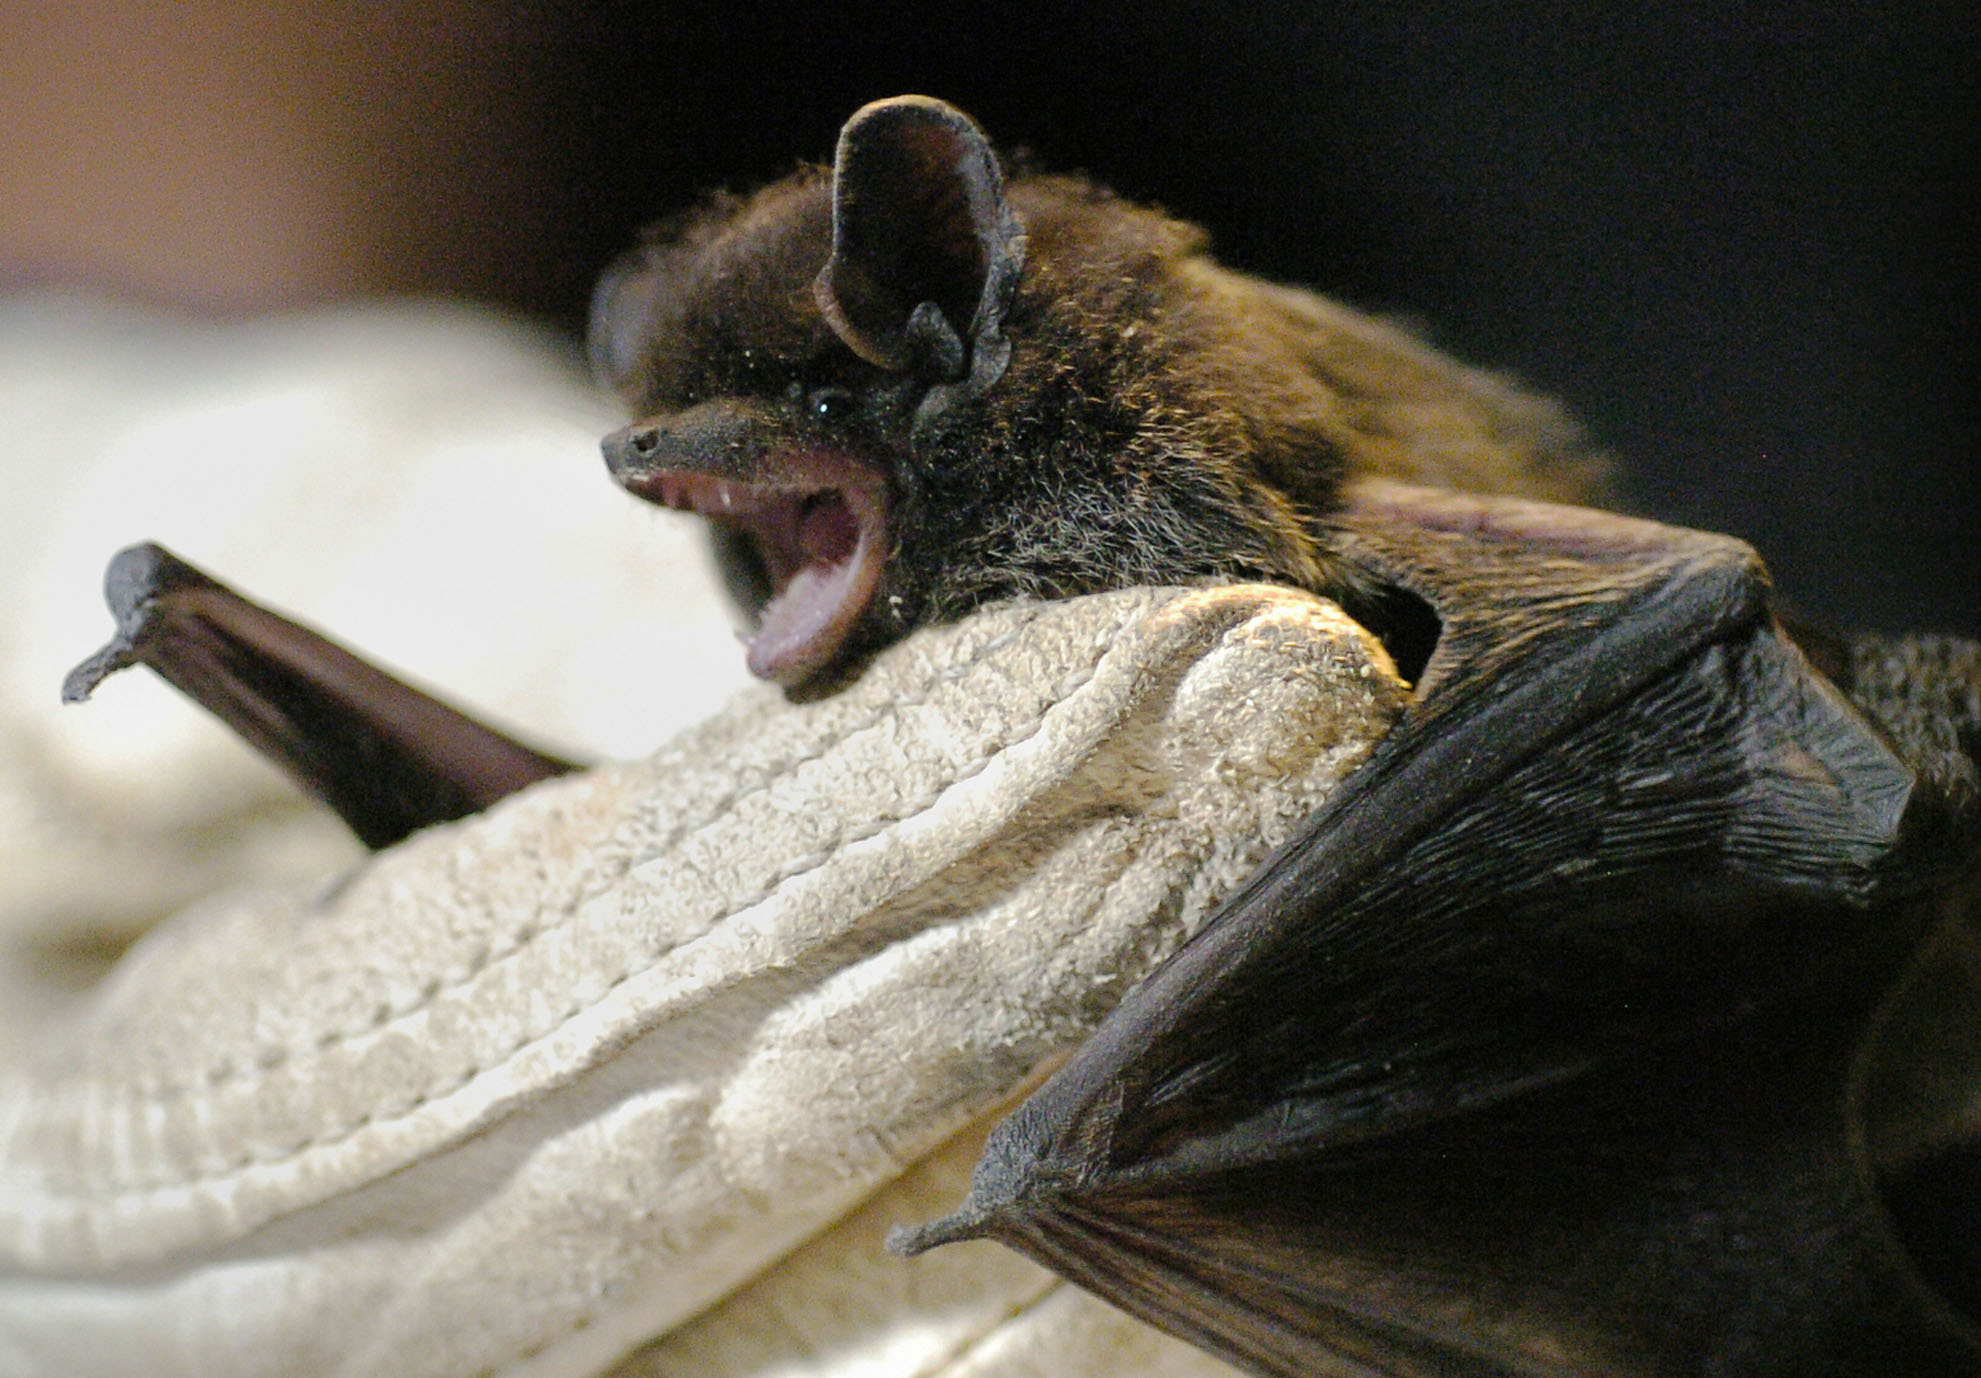 bat on stump bites angler along st joe river the